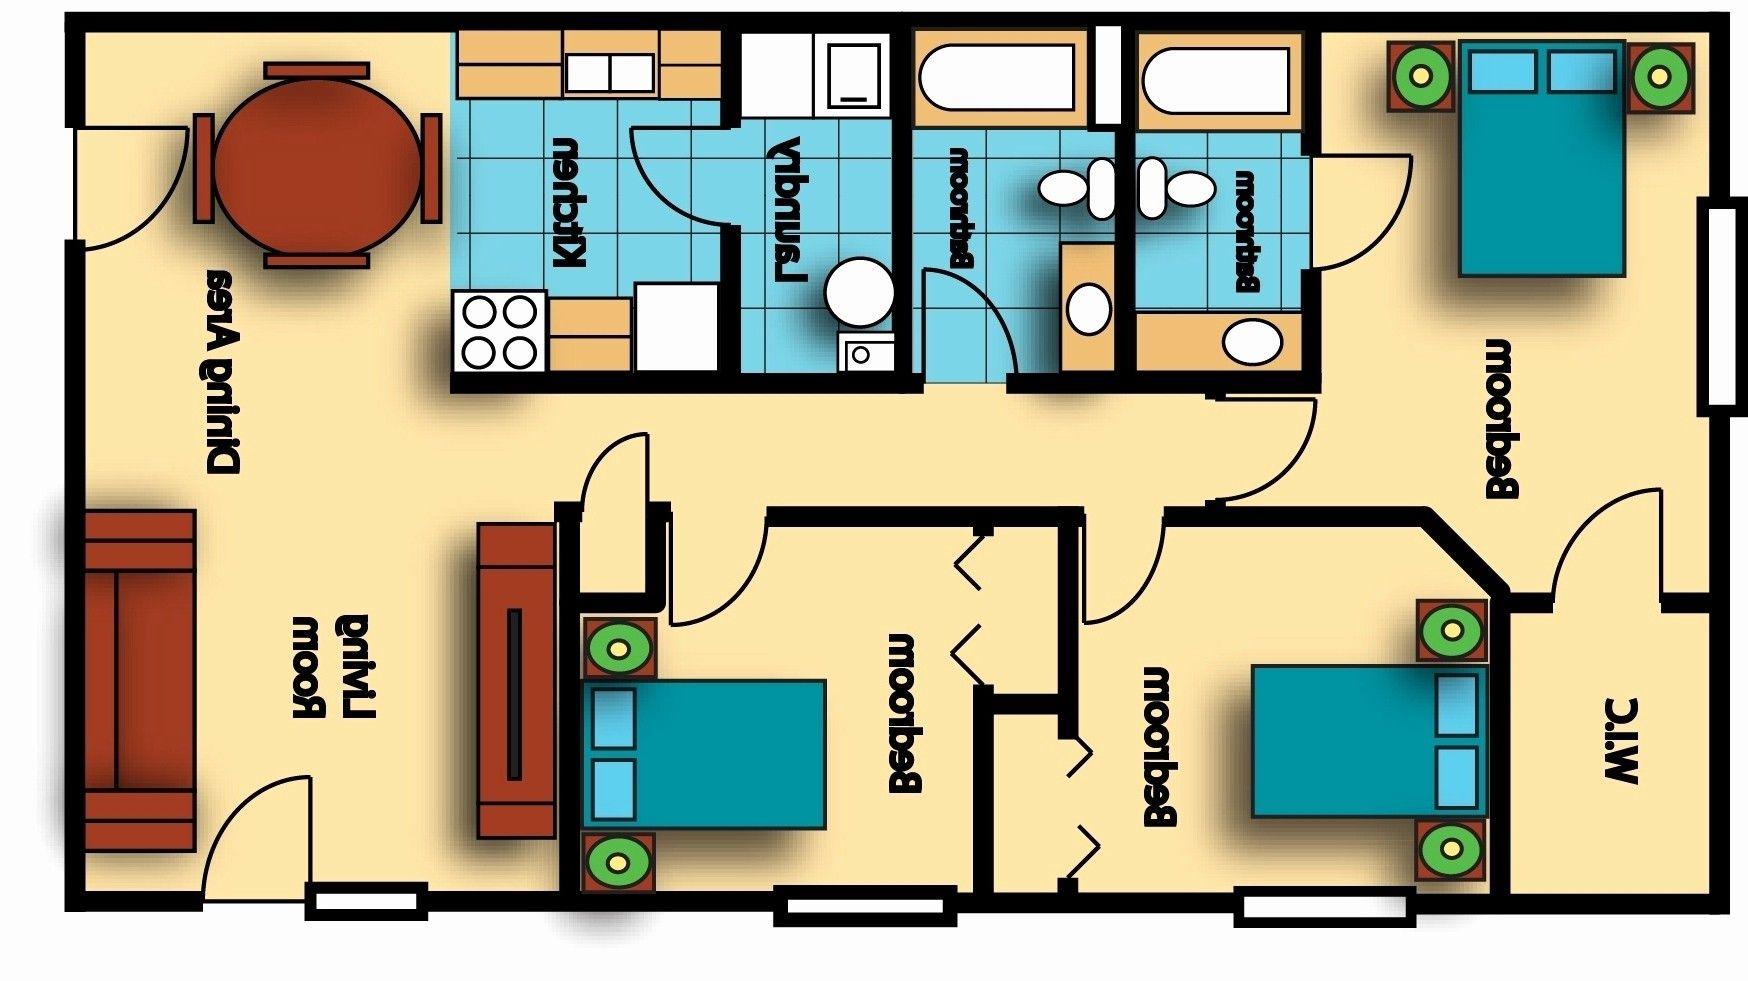 House  Plan  for 800  Sq  Ft  In Tamilnadu  Unique floor